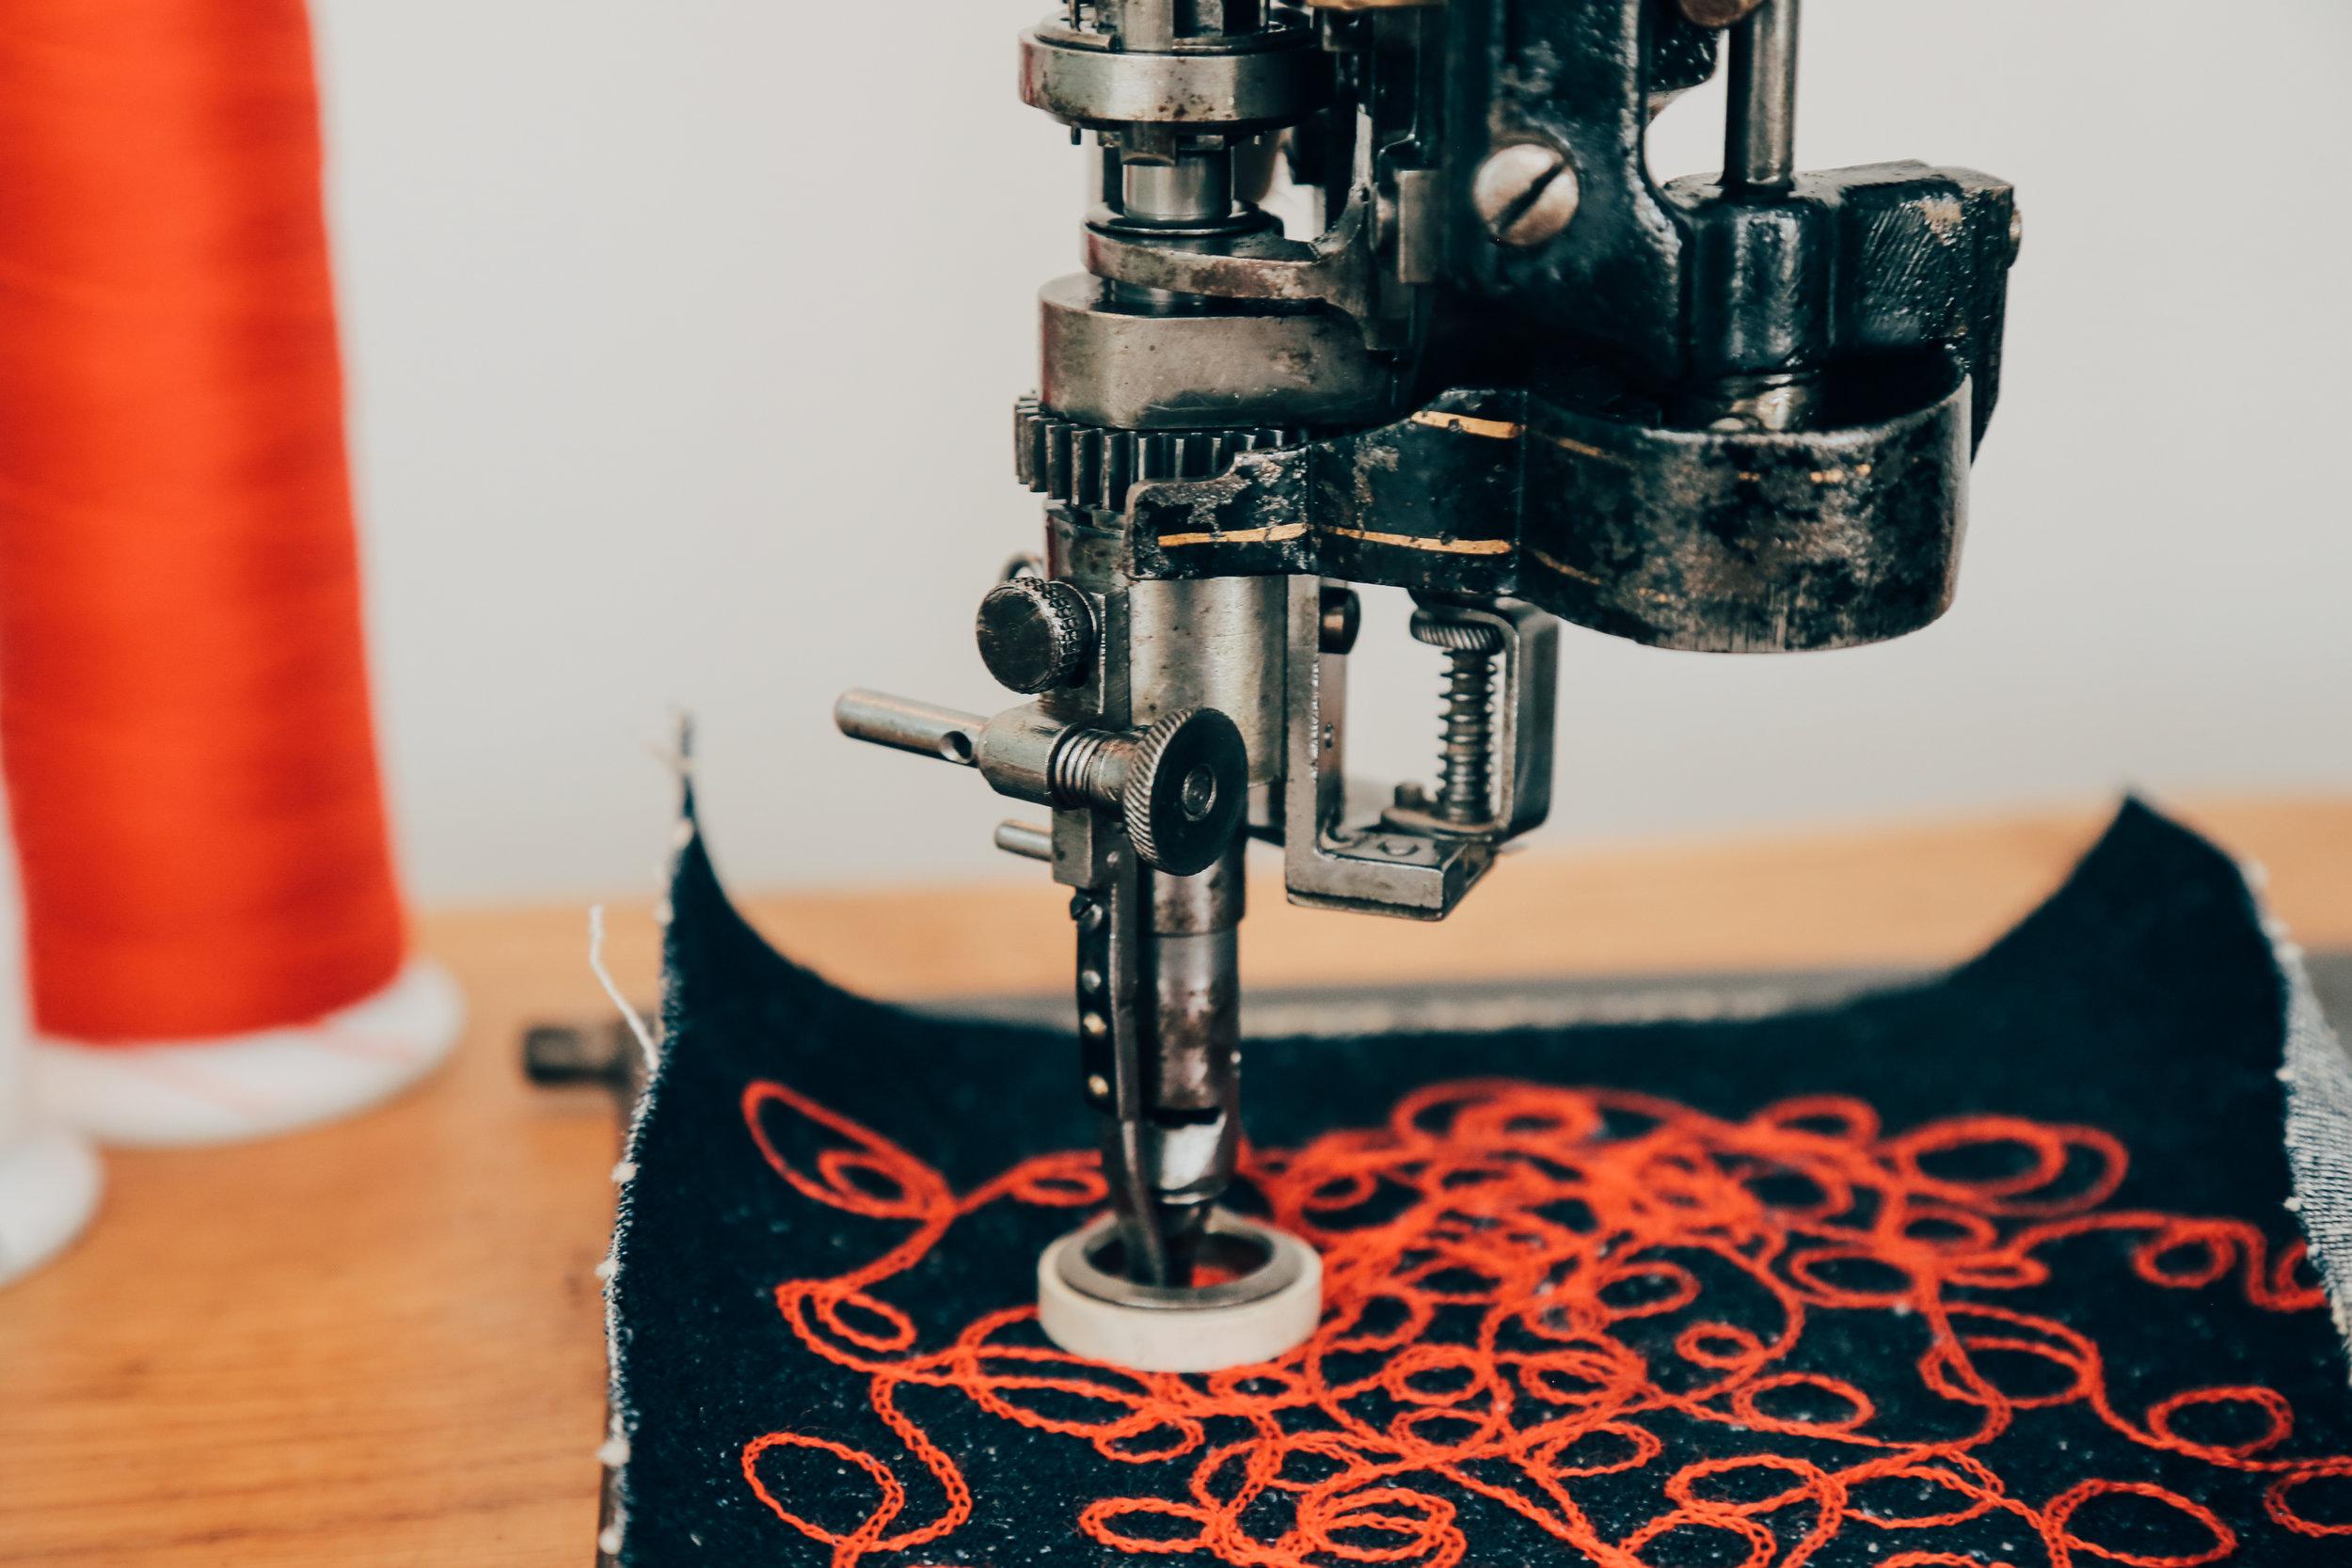 Lintz & Eckhardt 11 Cornely K vintage chain stitch embroidery machine 8